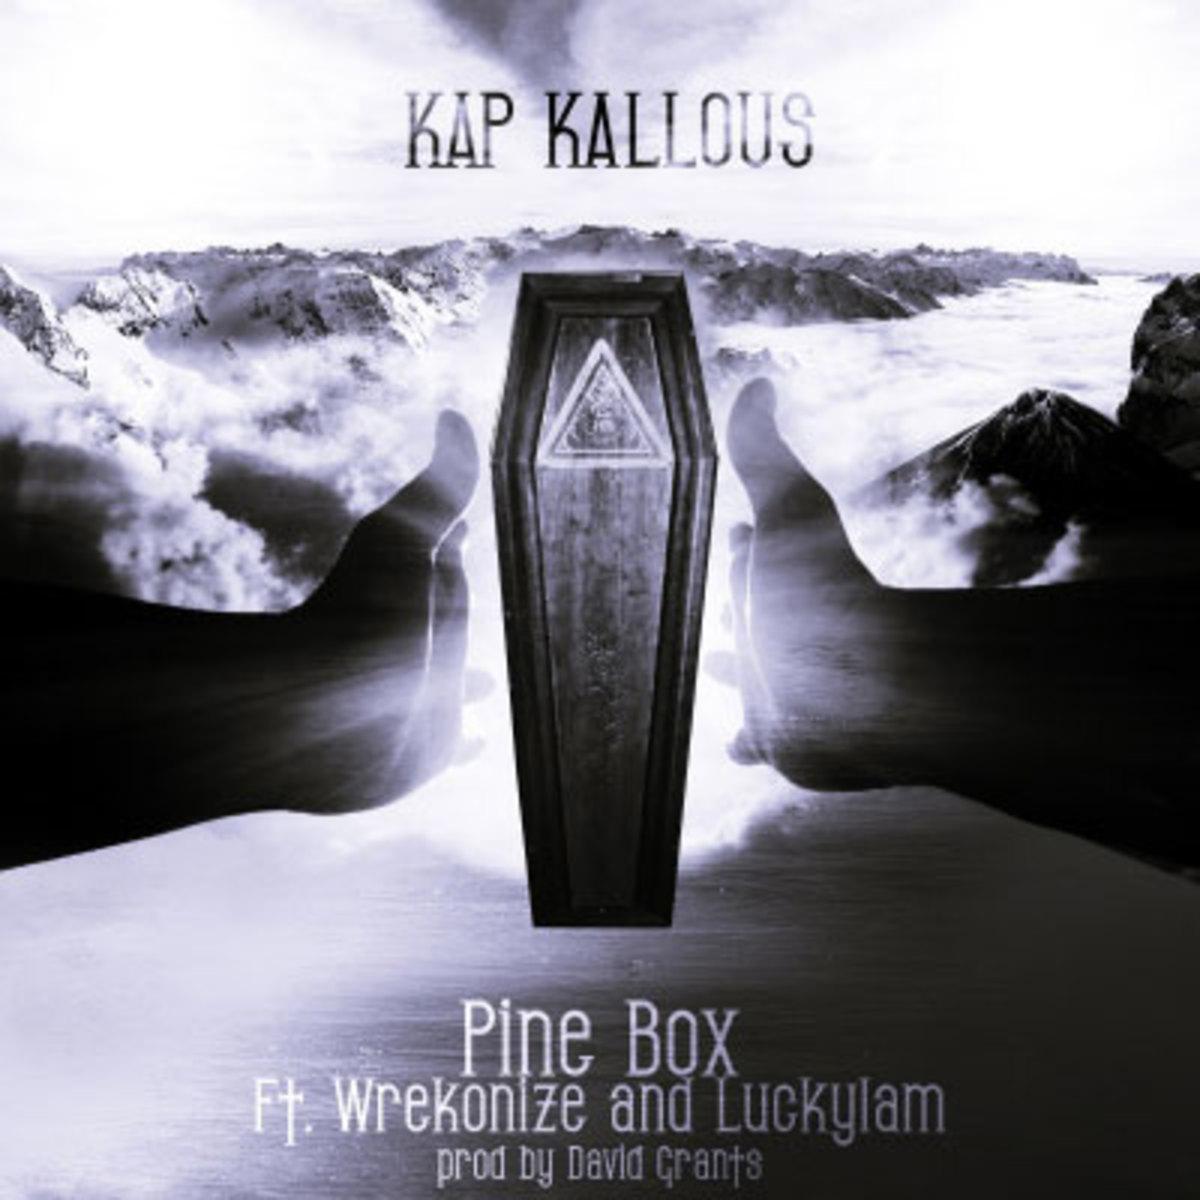 kap-kallous-pine-box.jpg